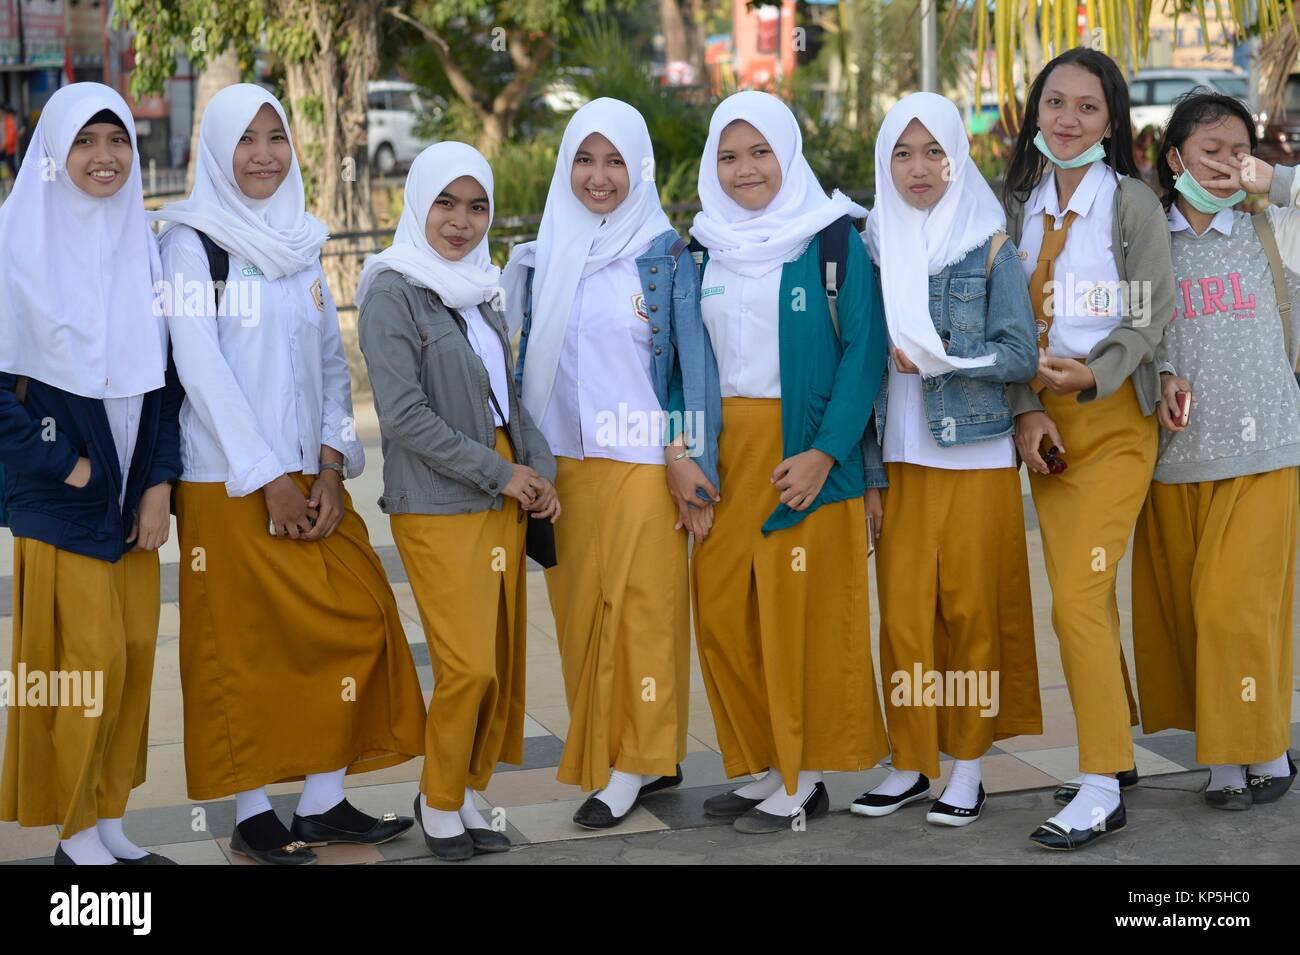 Group of Muslim School Girls in Makassar,(formerly Ujung Pandang), Sulawesi island,Indonesia. - Stock Image